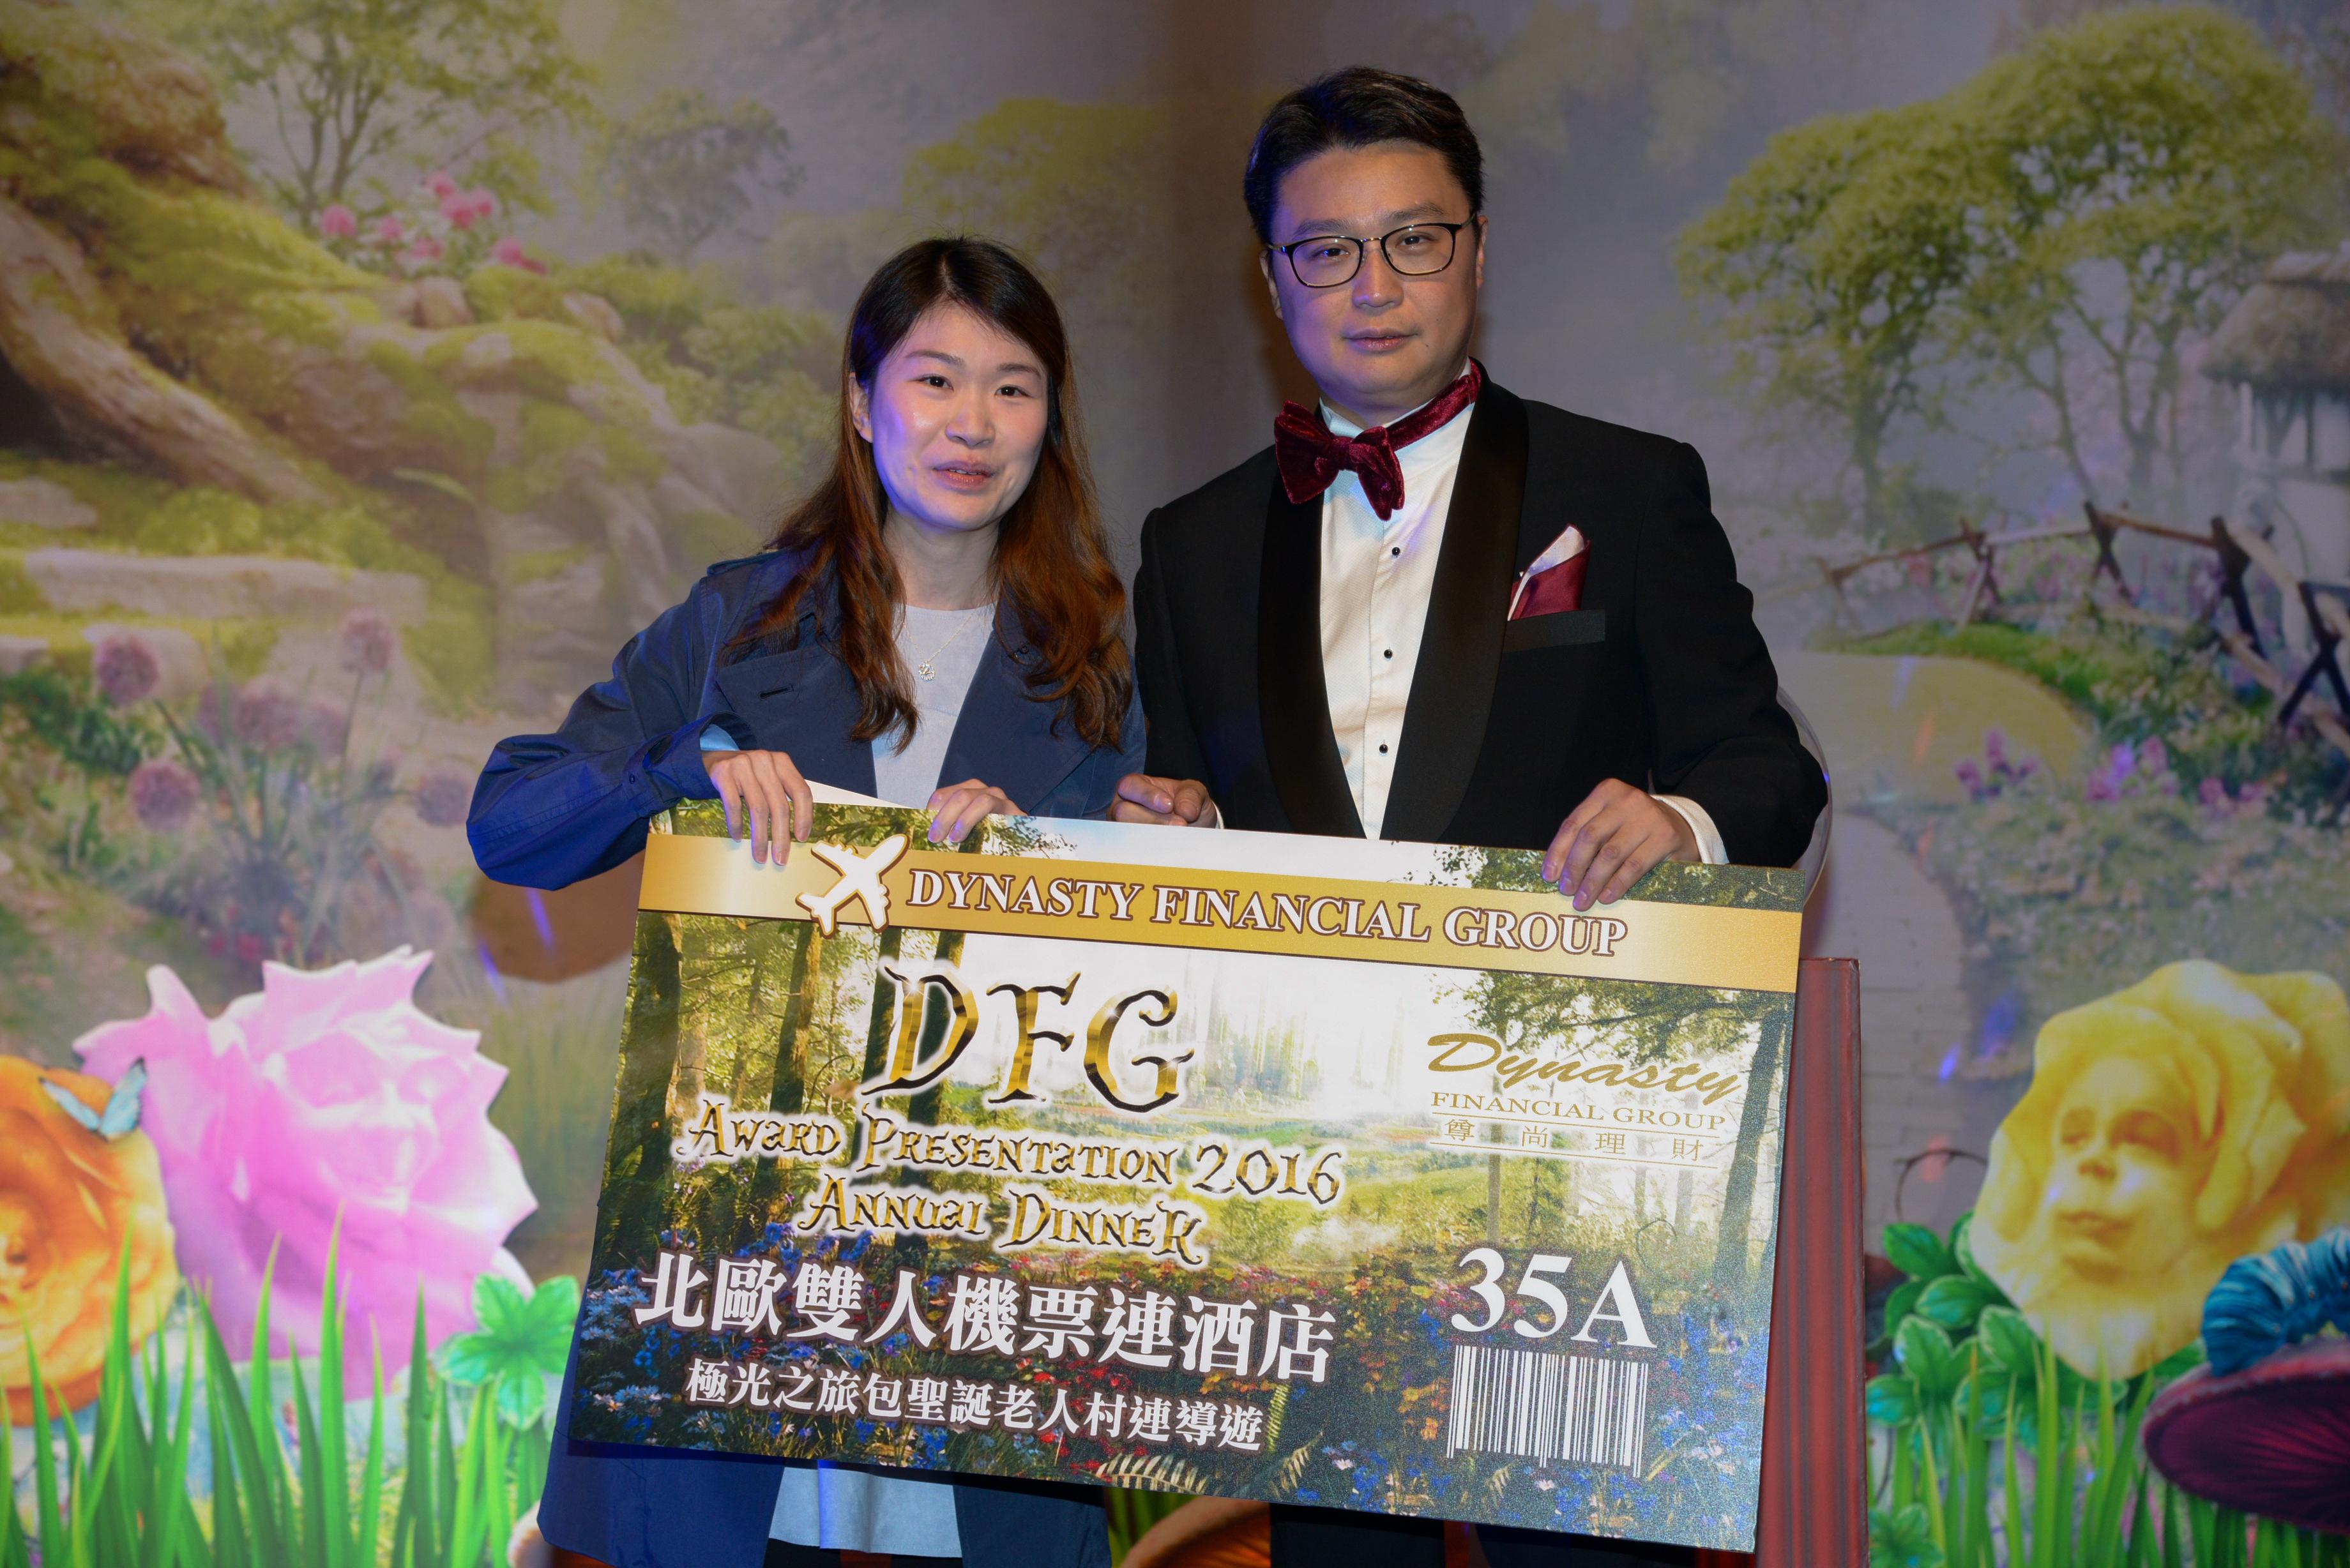 DFG Award Presentation 2016 Annual D